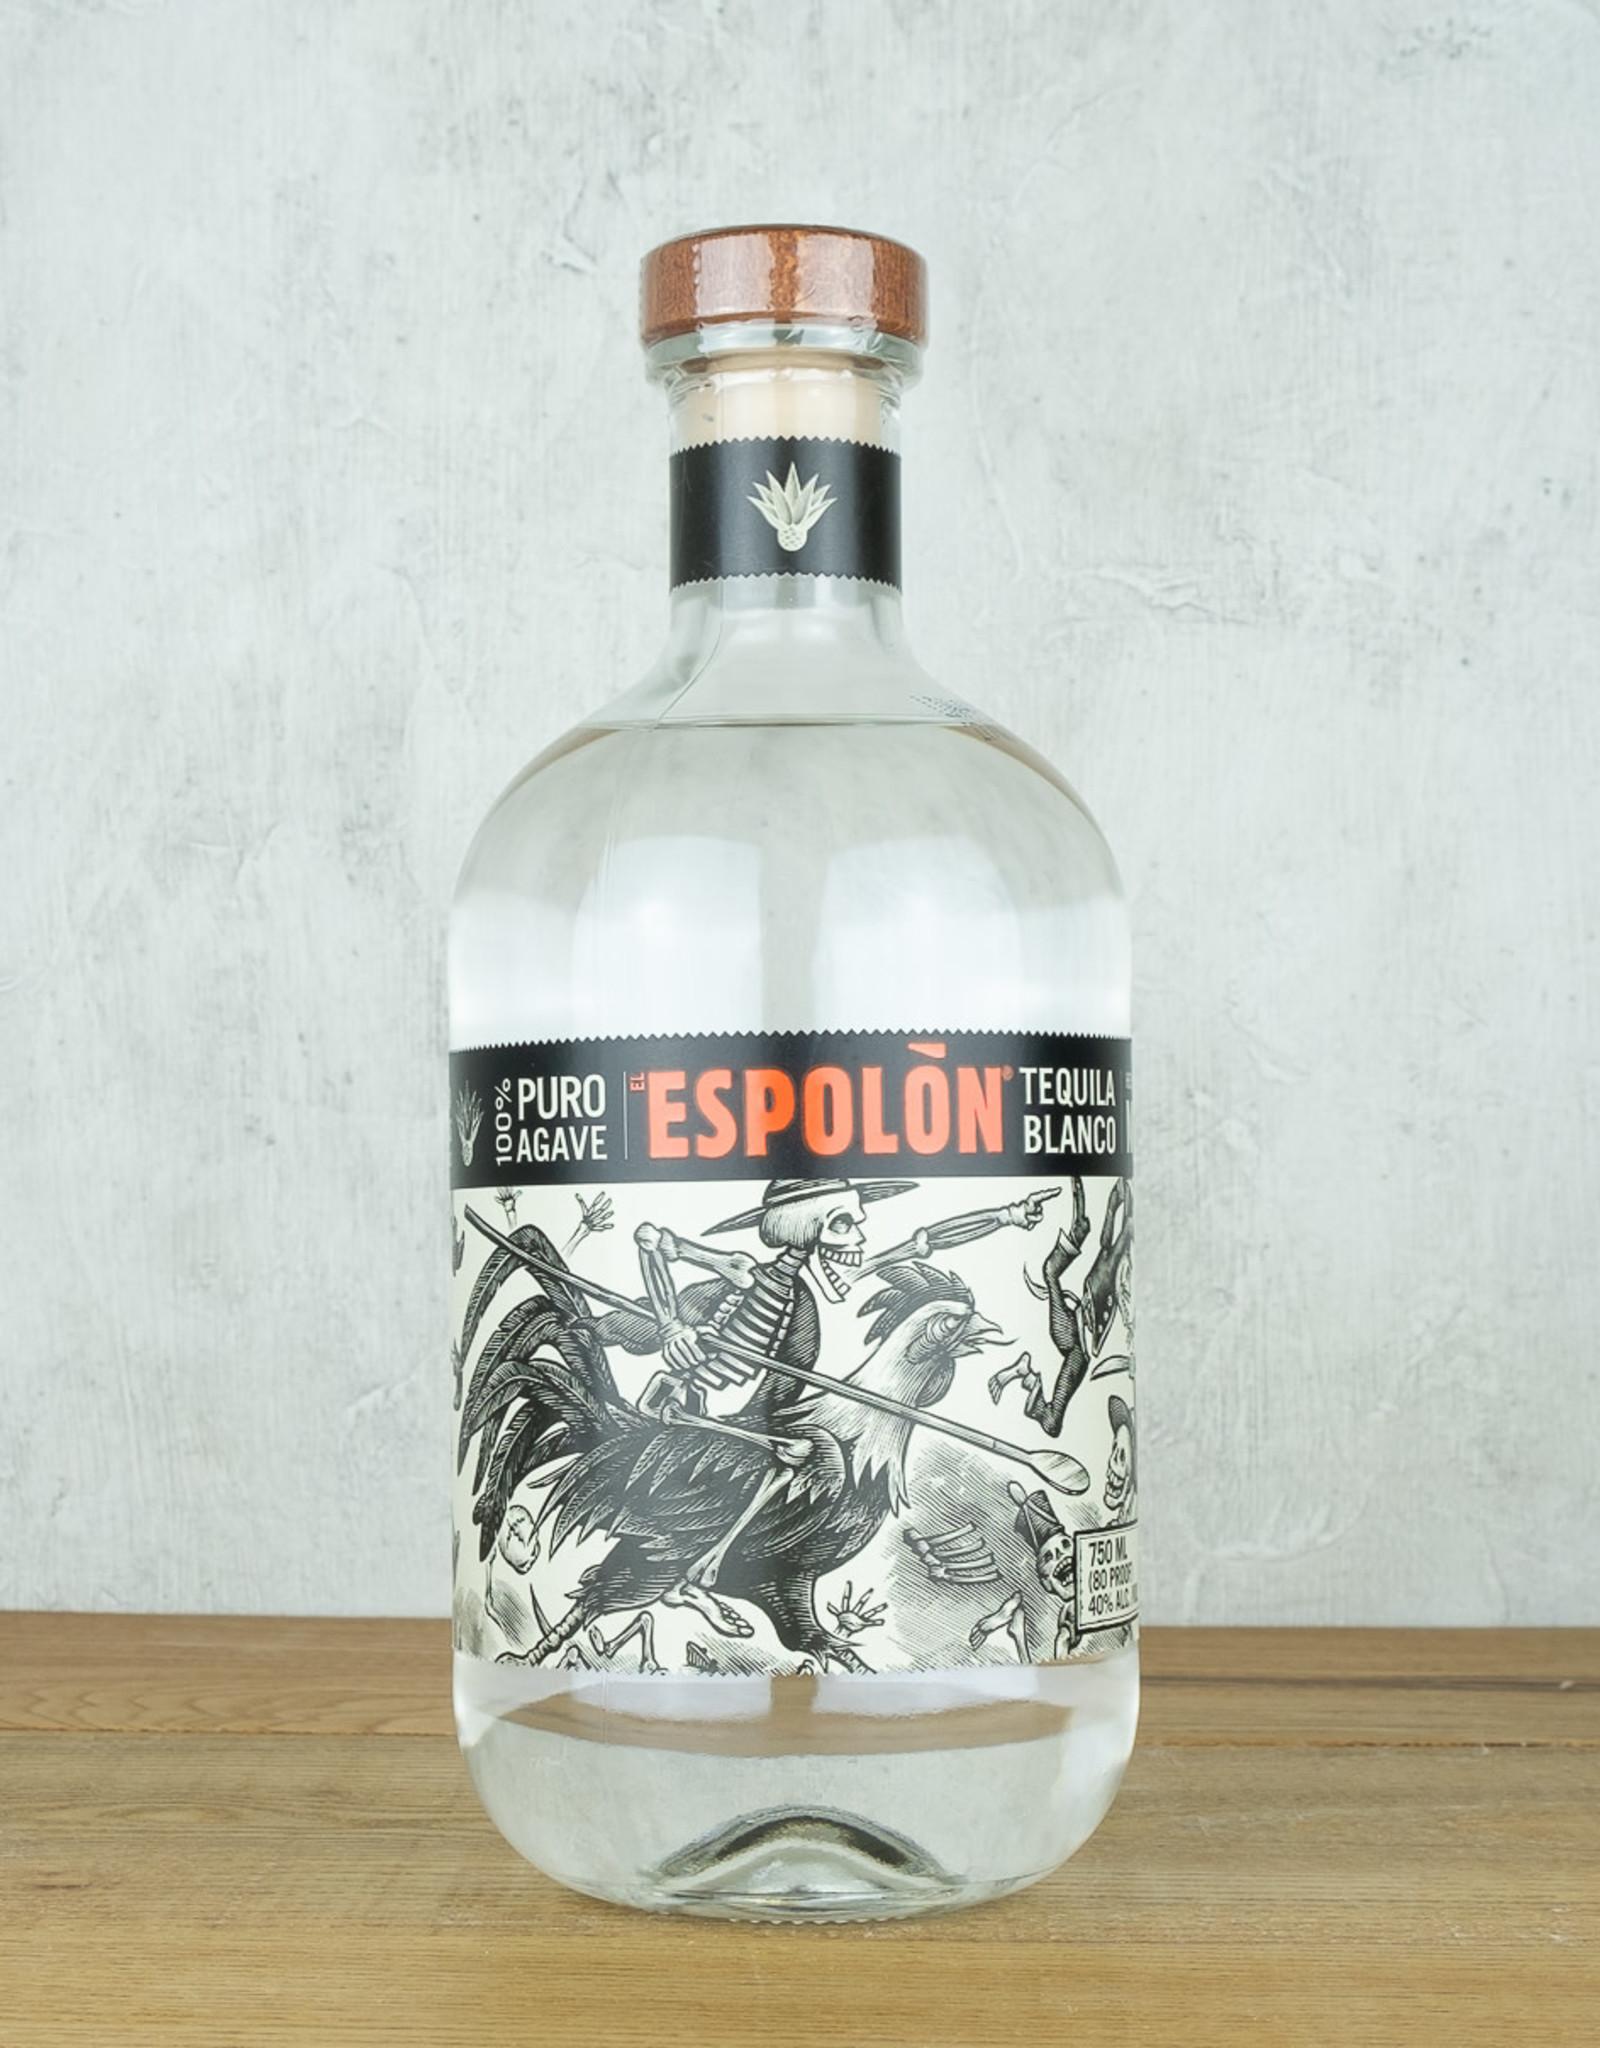 Espolon Tequila Blanco